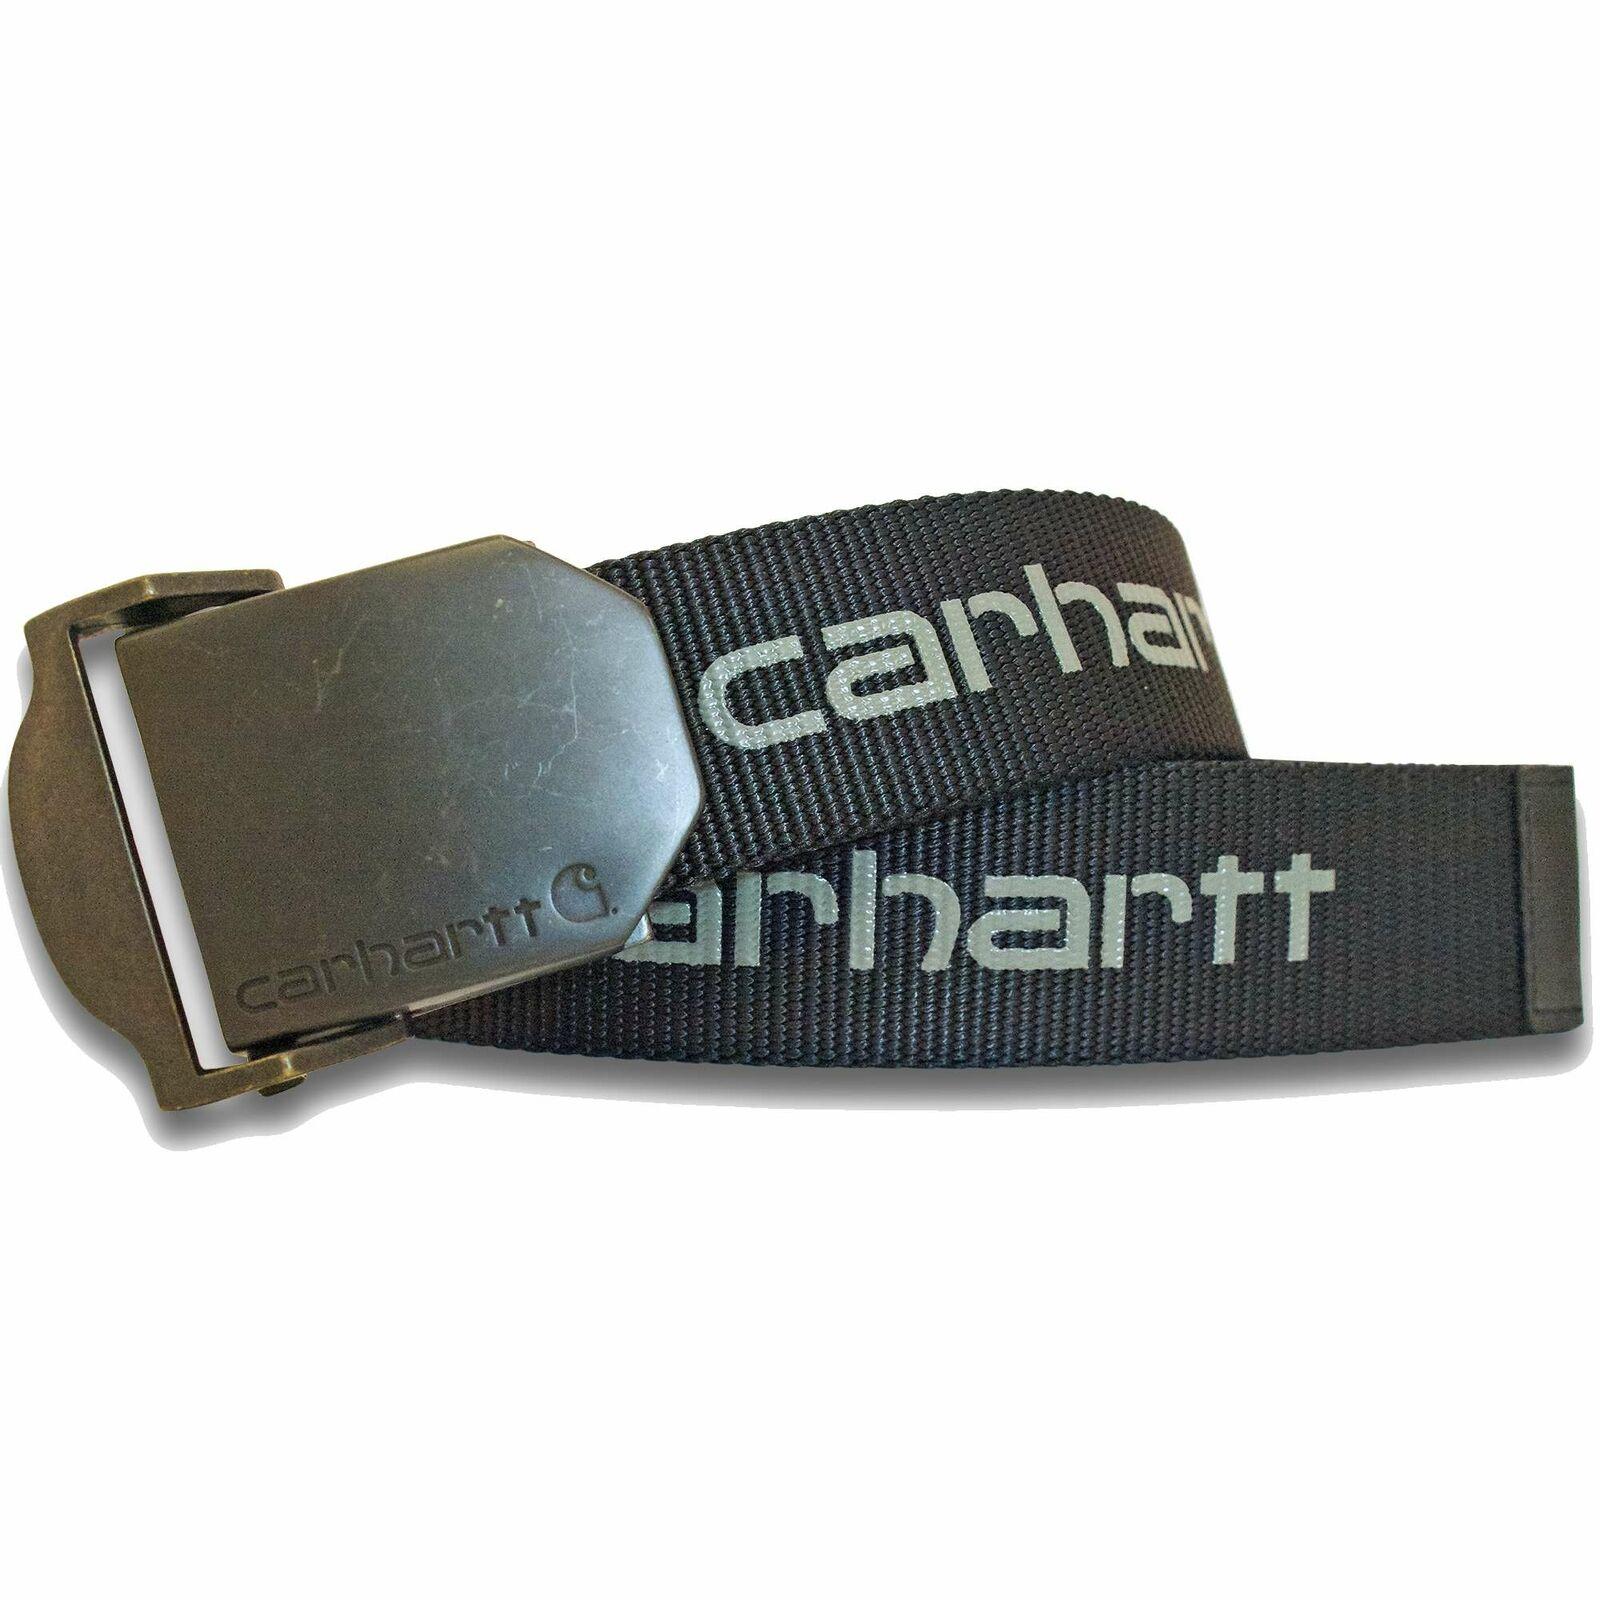 Carhartt Unisex Belt Webbing Belt